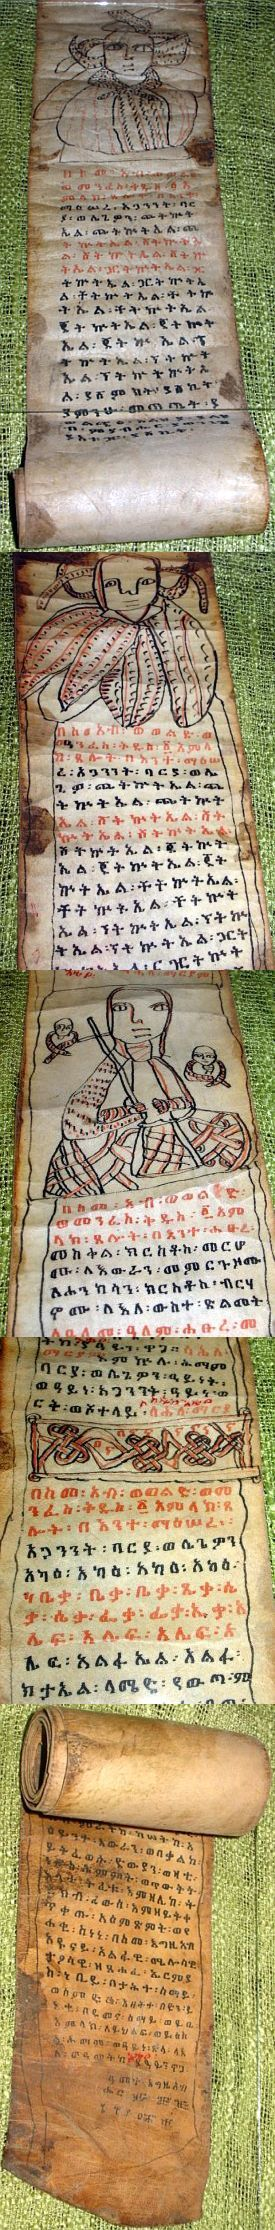 Antique Coptic Christian Hand Written Scroll - Marwick Magic Scroll #15